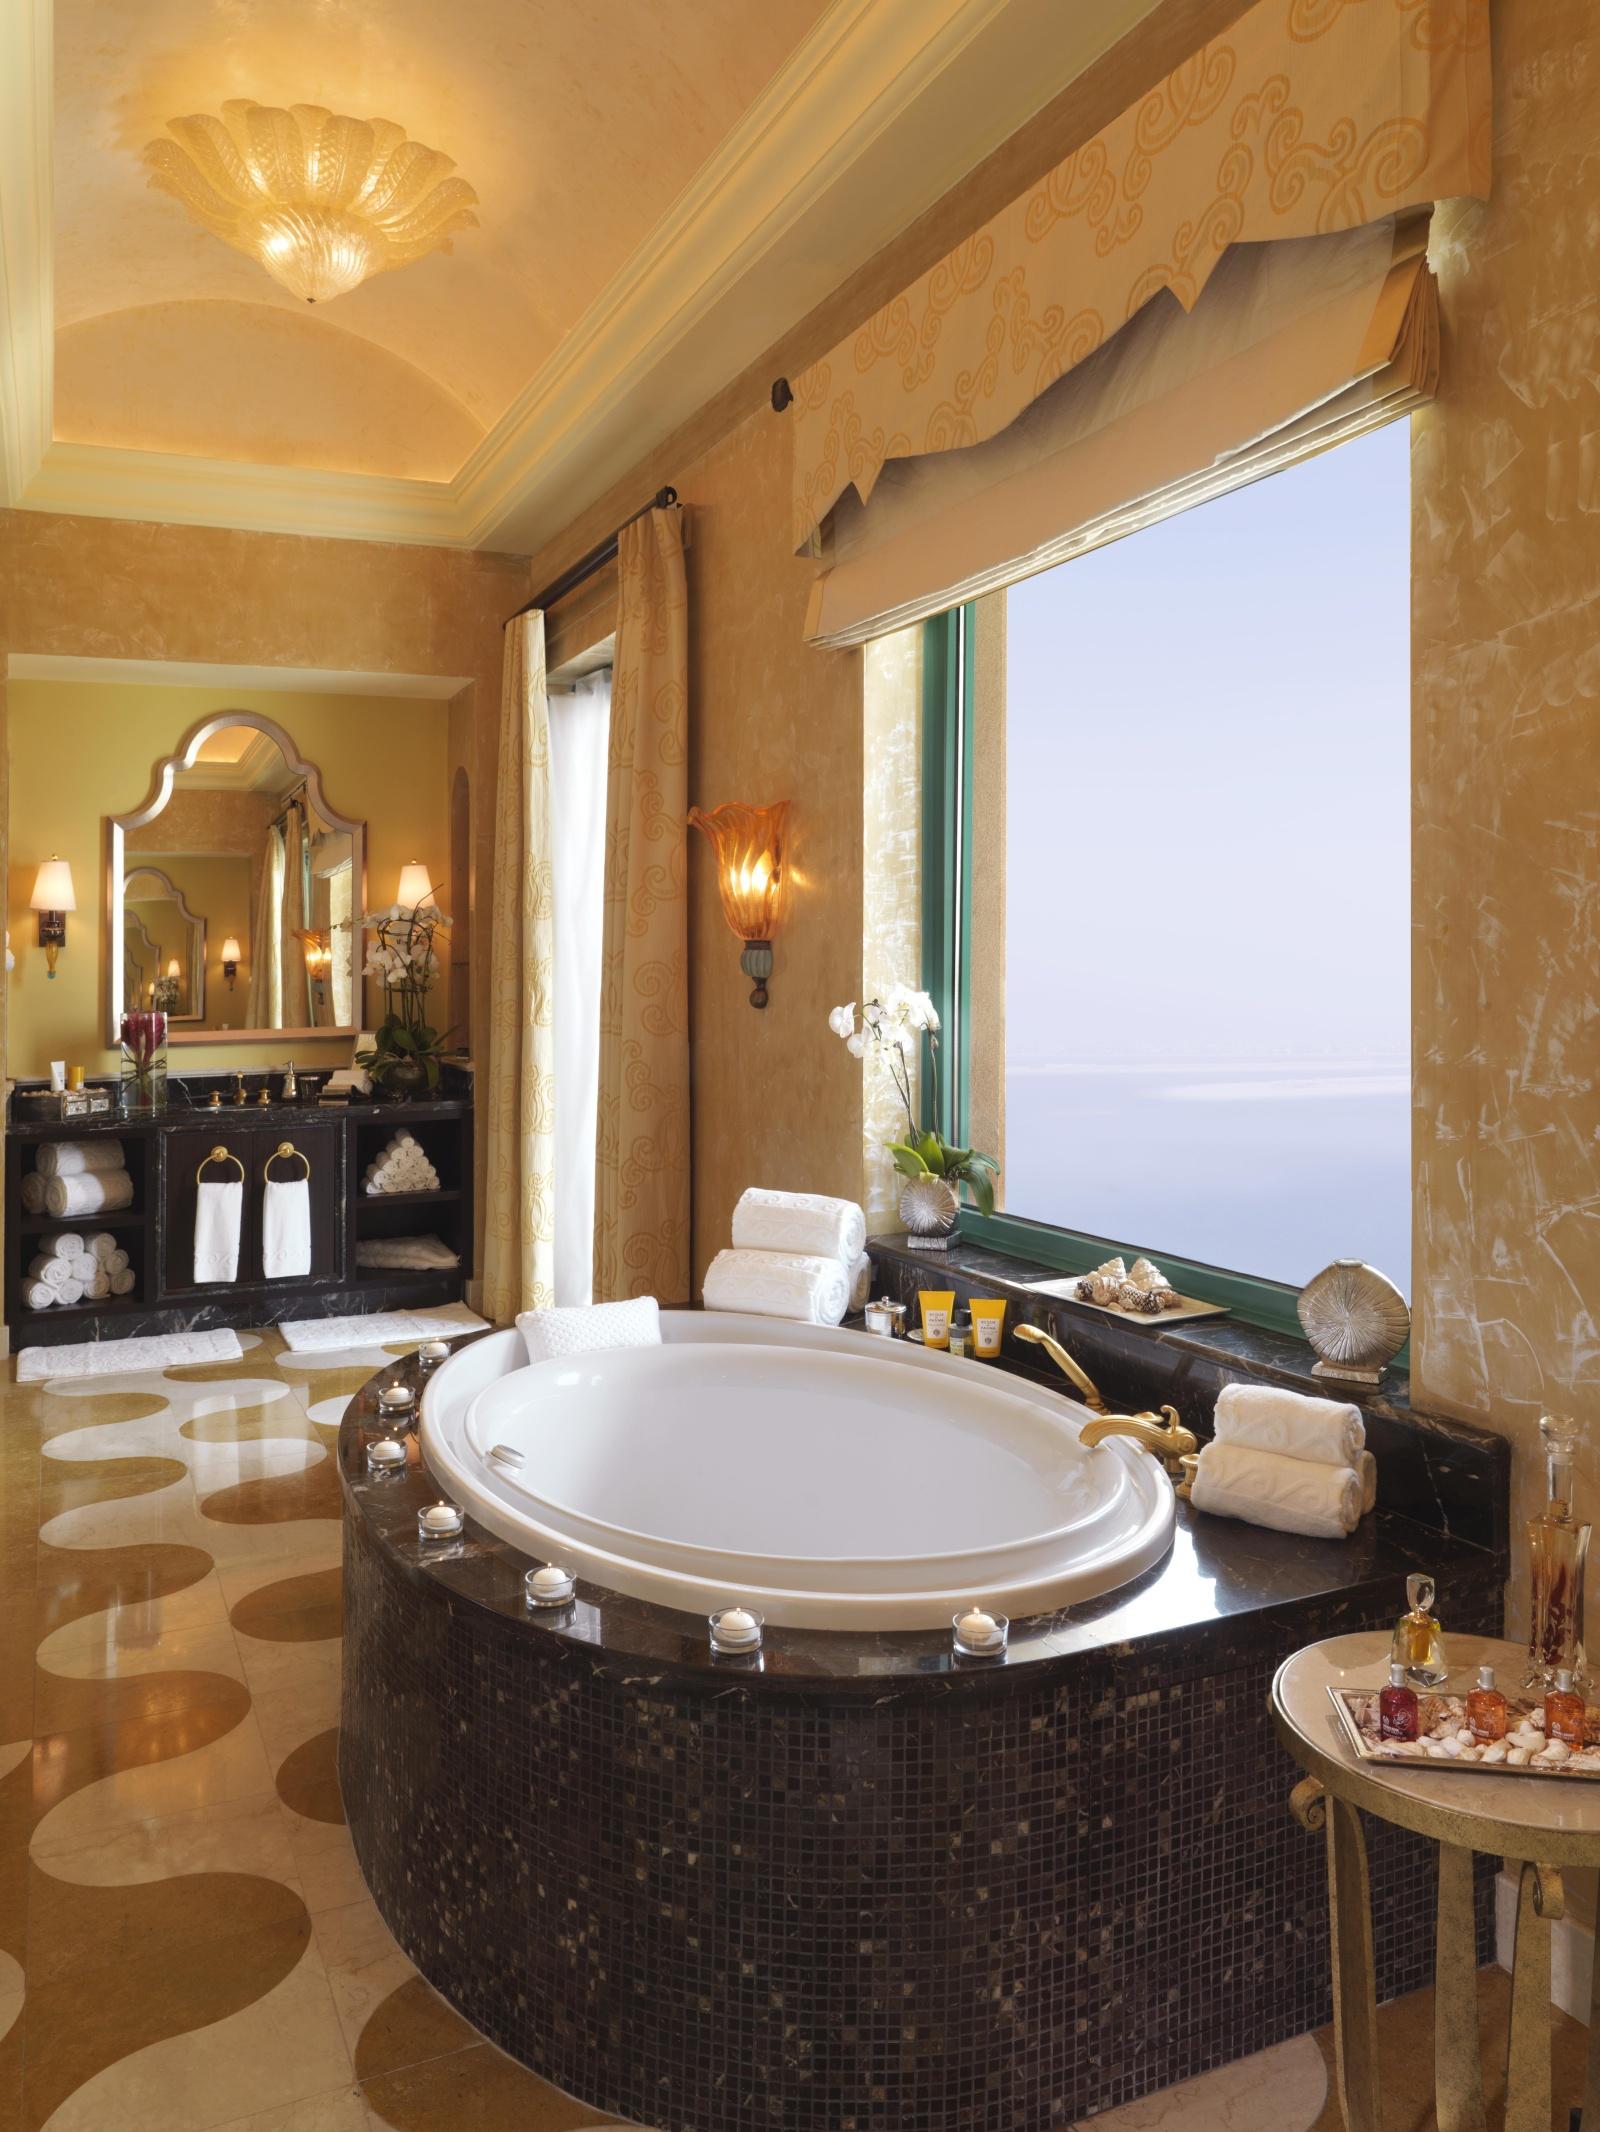 Atlantis hotel dubai for The most expensive hotel room in dubai